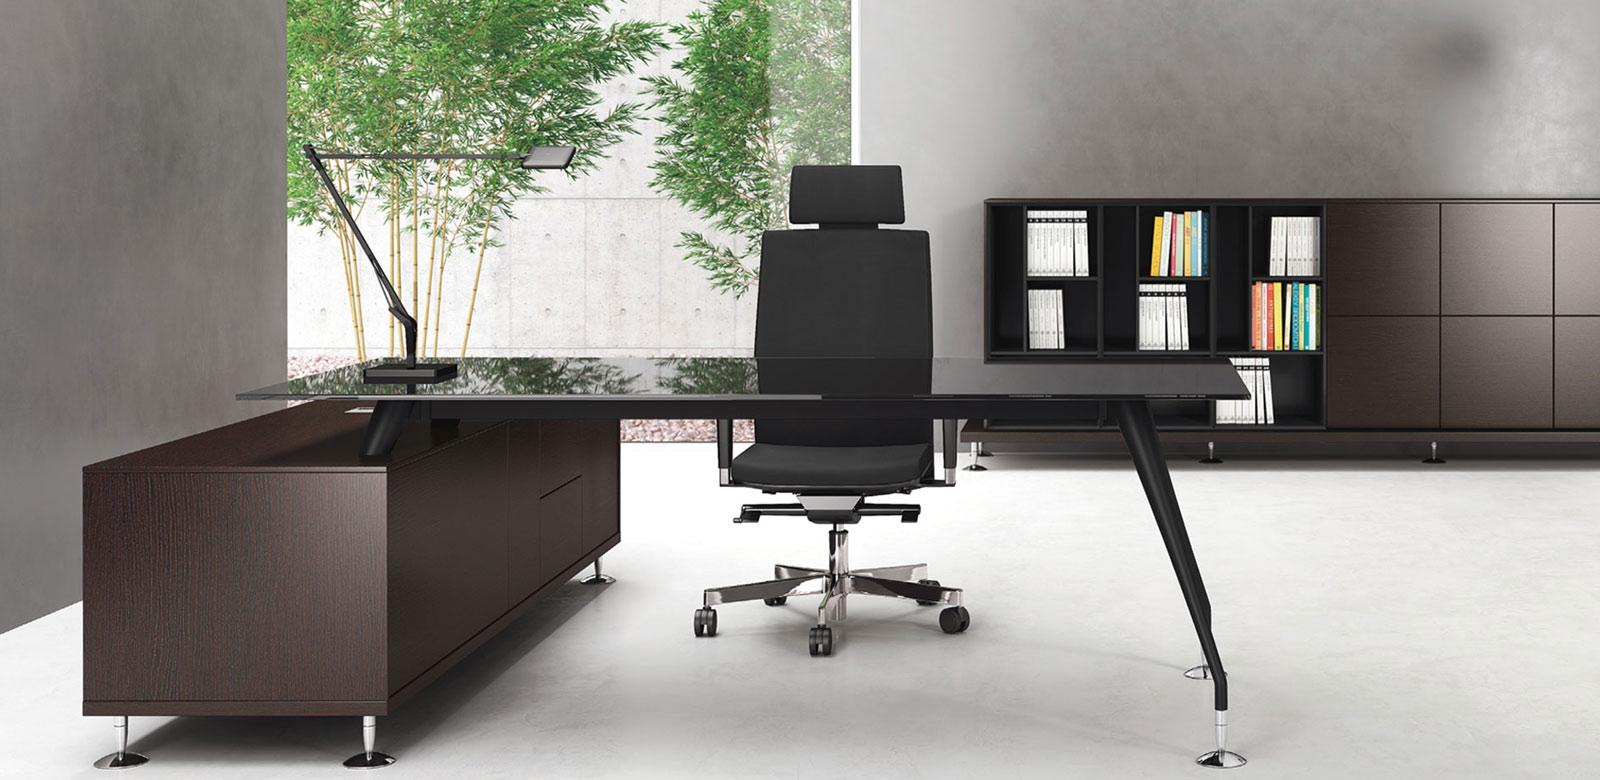 Free arredo ufficio moderno loft with arredo ufficio for Arredo ufficio prezzi